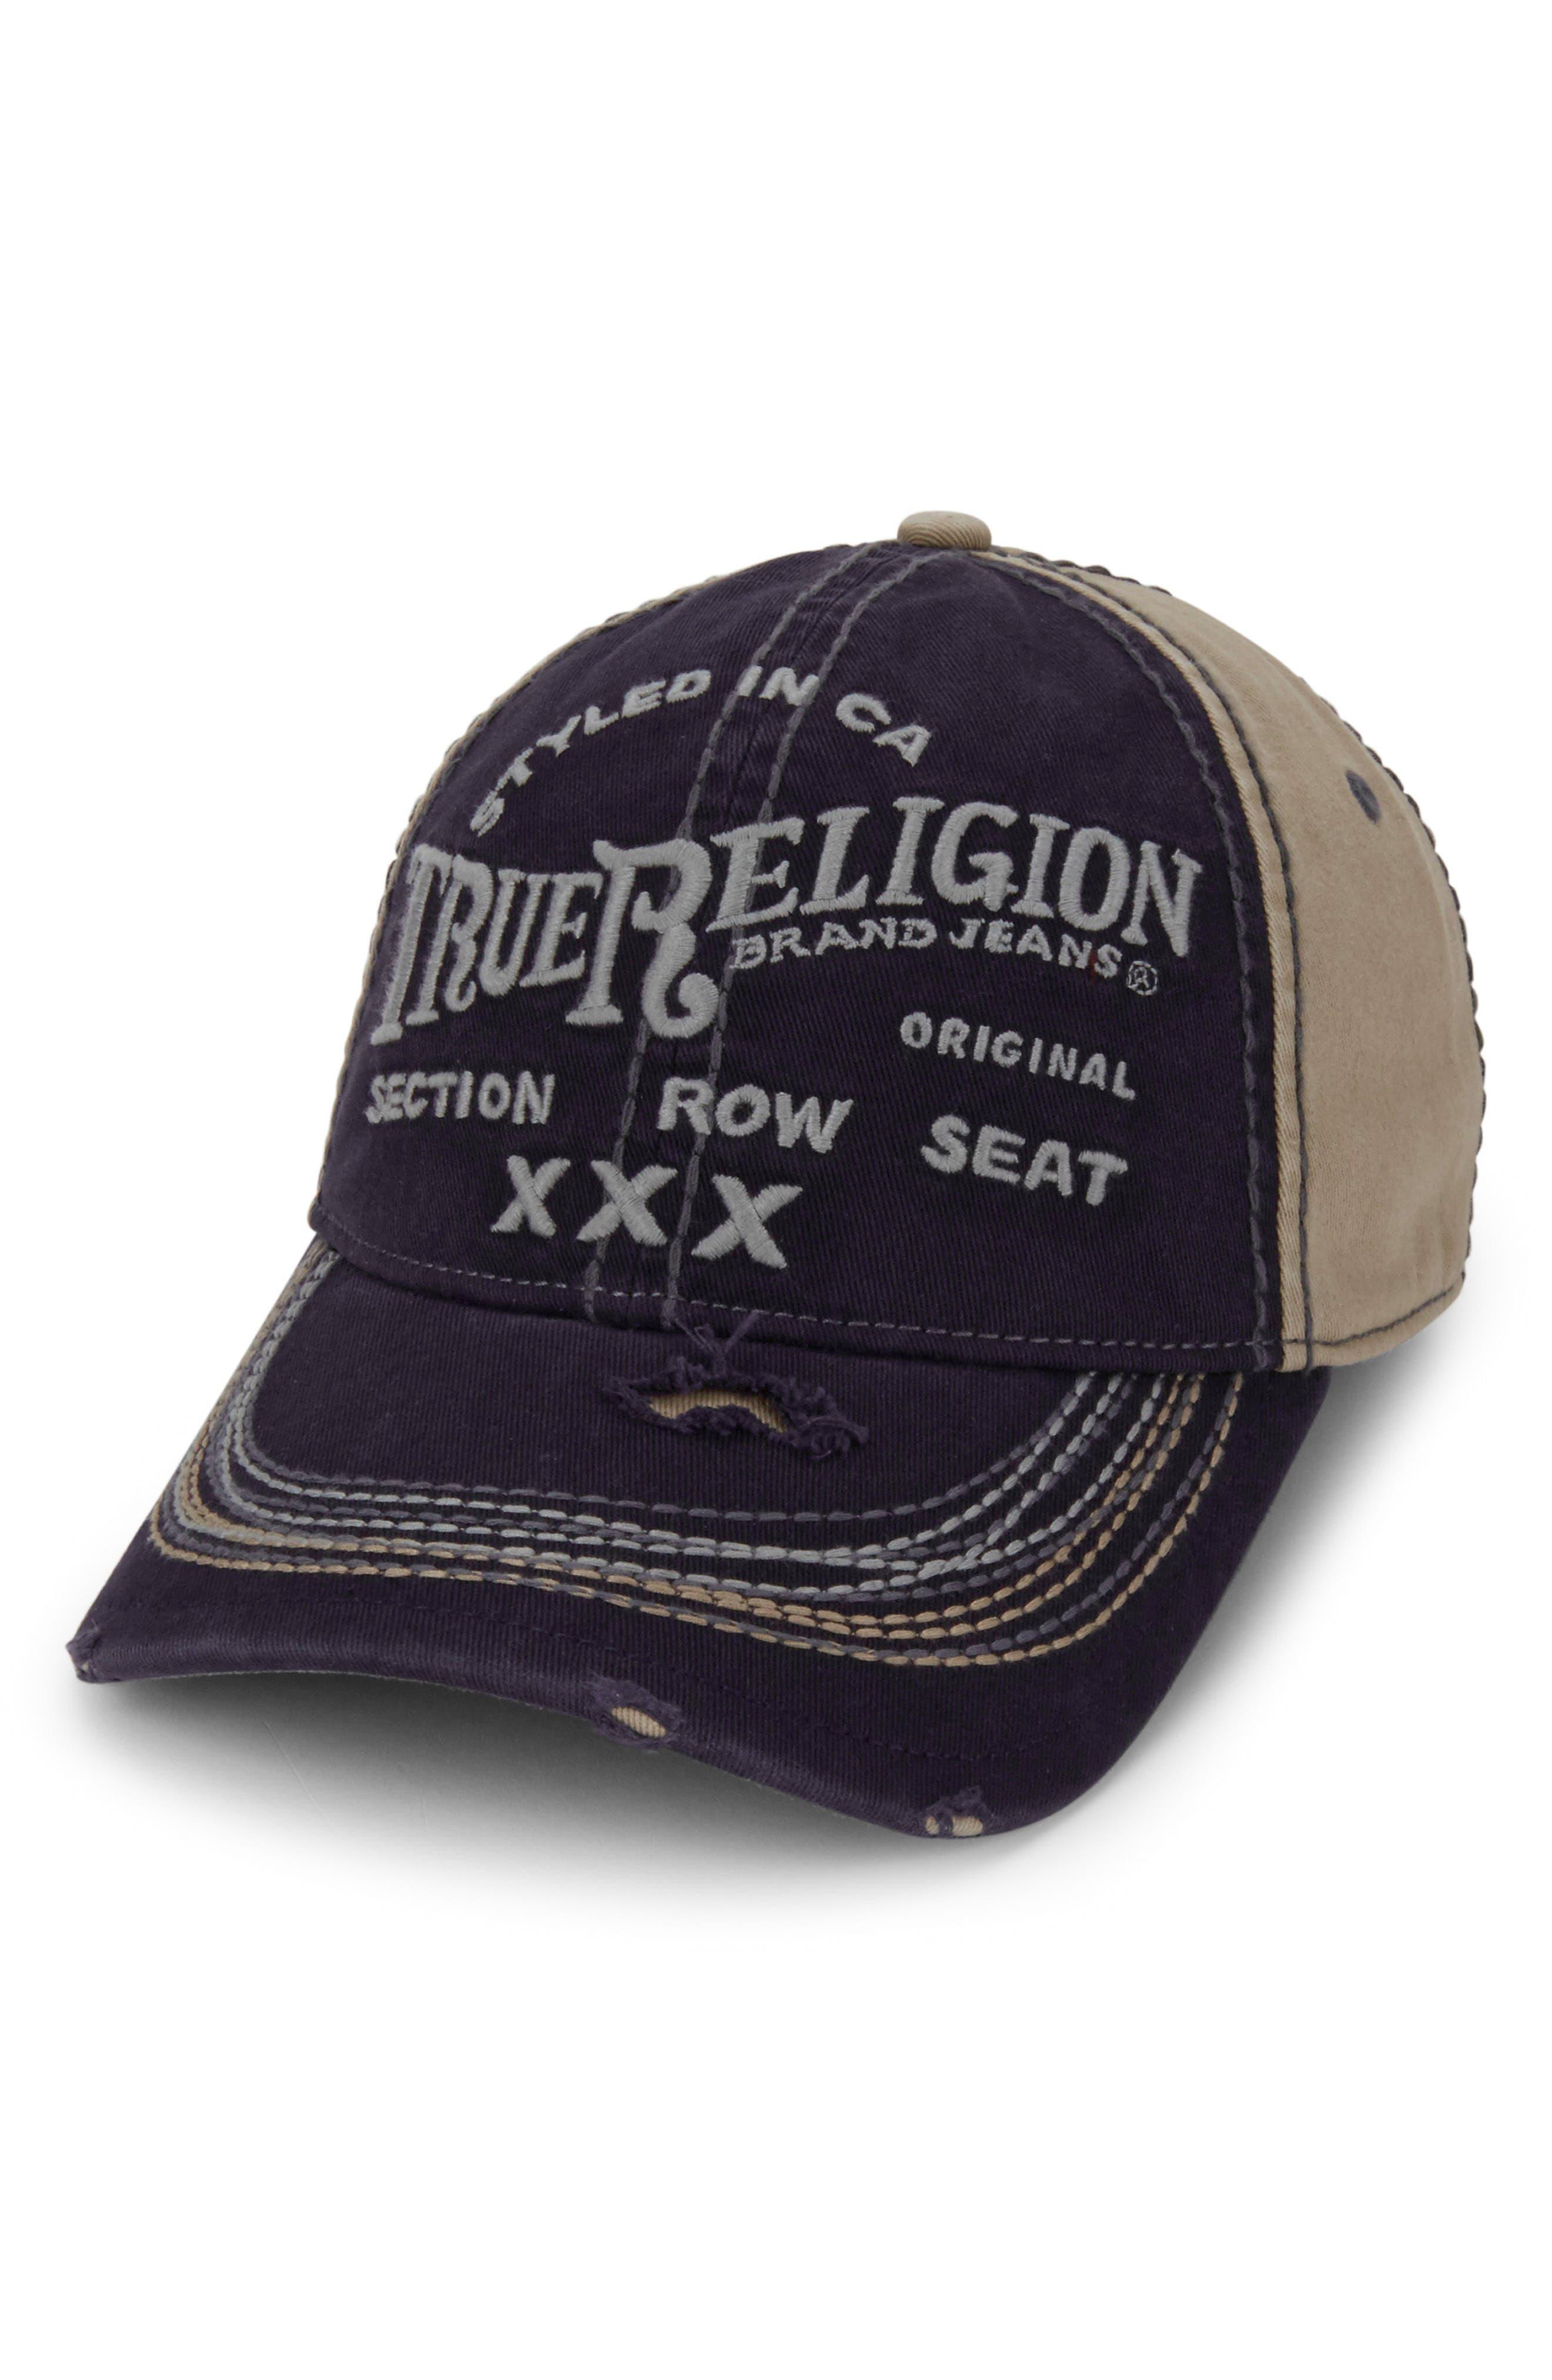 Alternate Image 1 Selected - True Religion Brand Jeans 'Triple X' Baseball Cap